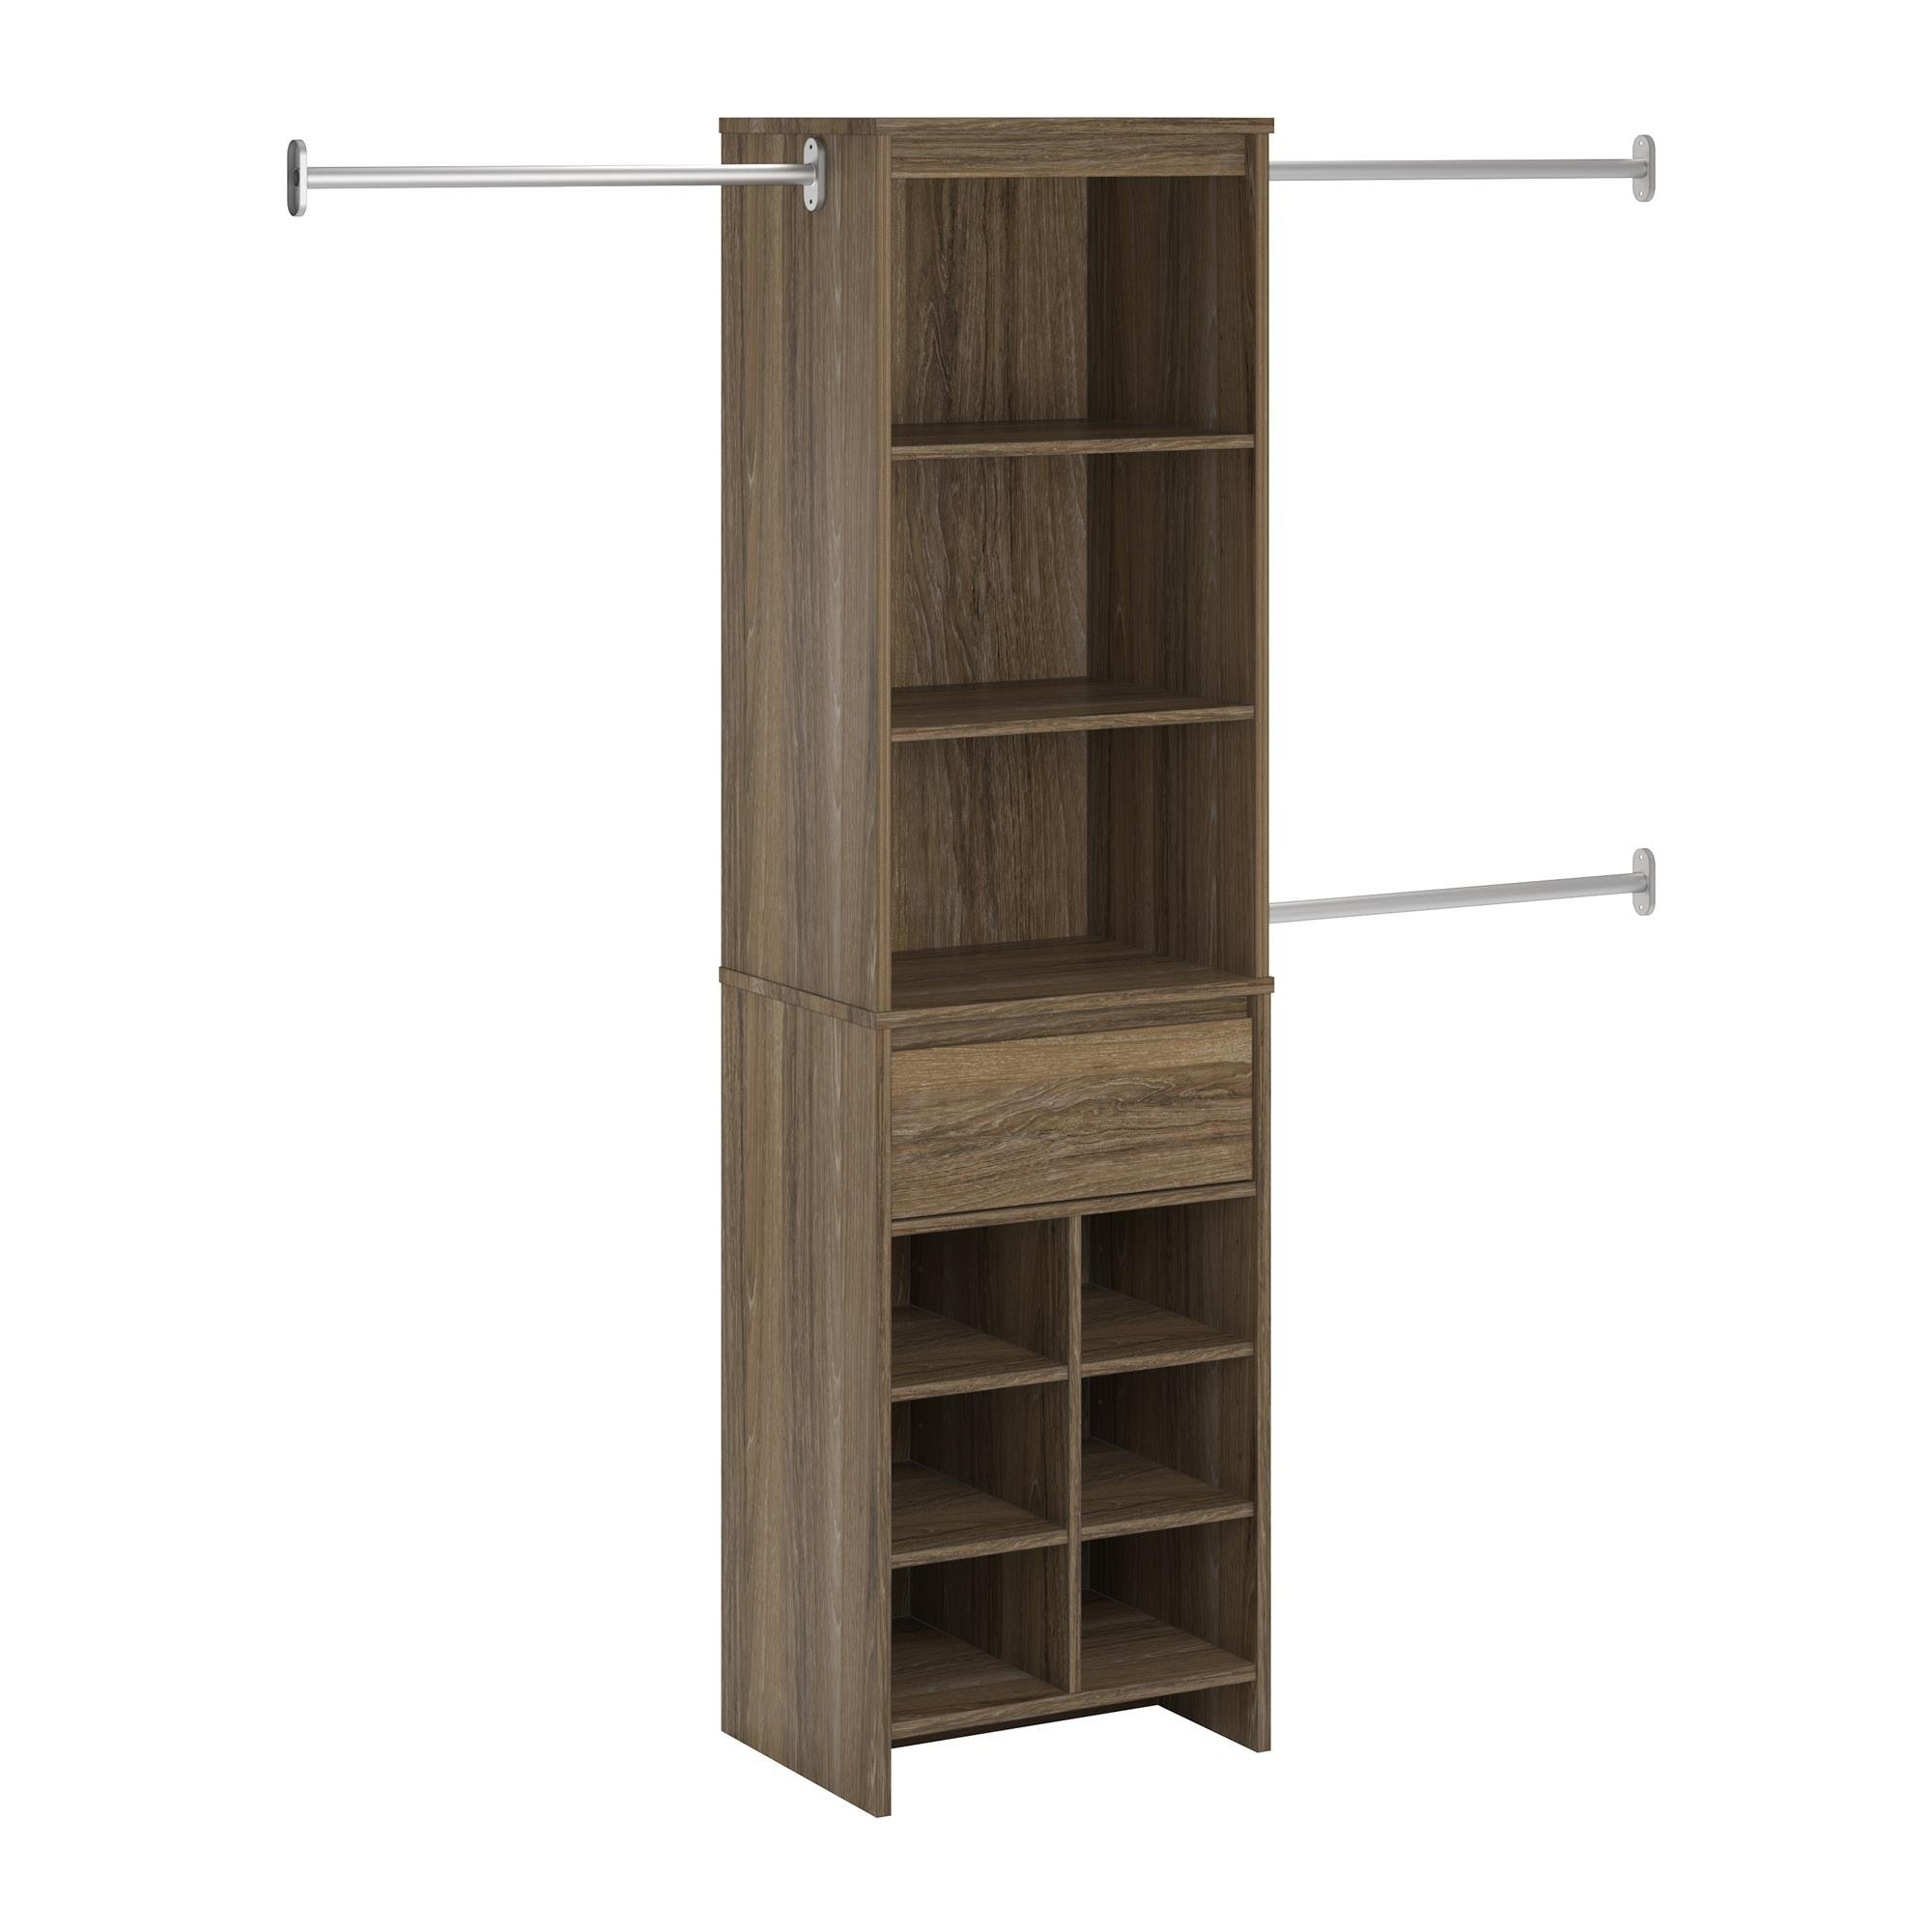 Ameriwood Home Adult Closet System, Weathered Oak